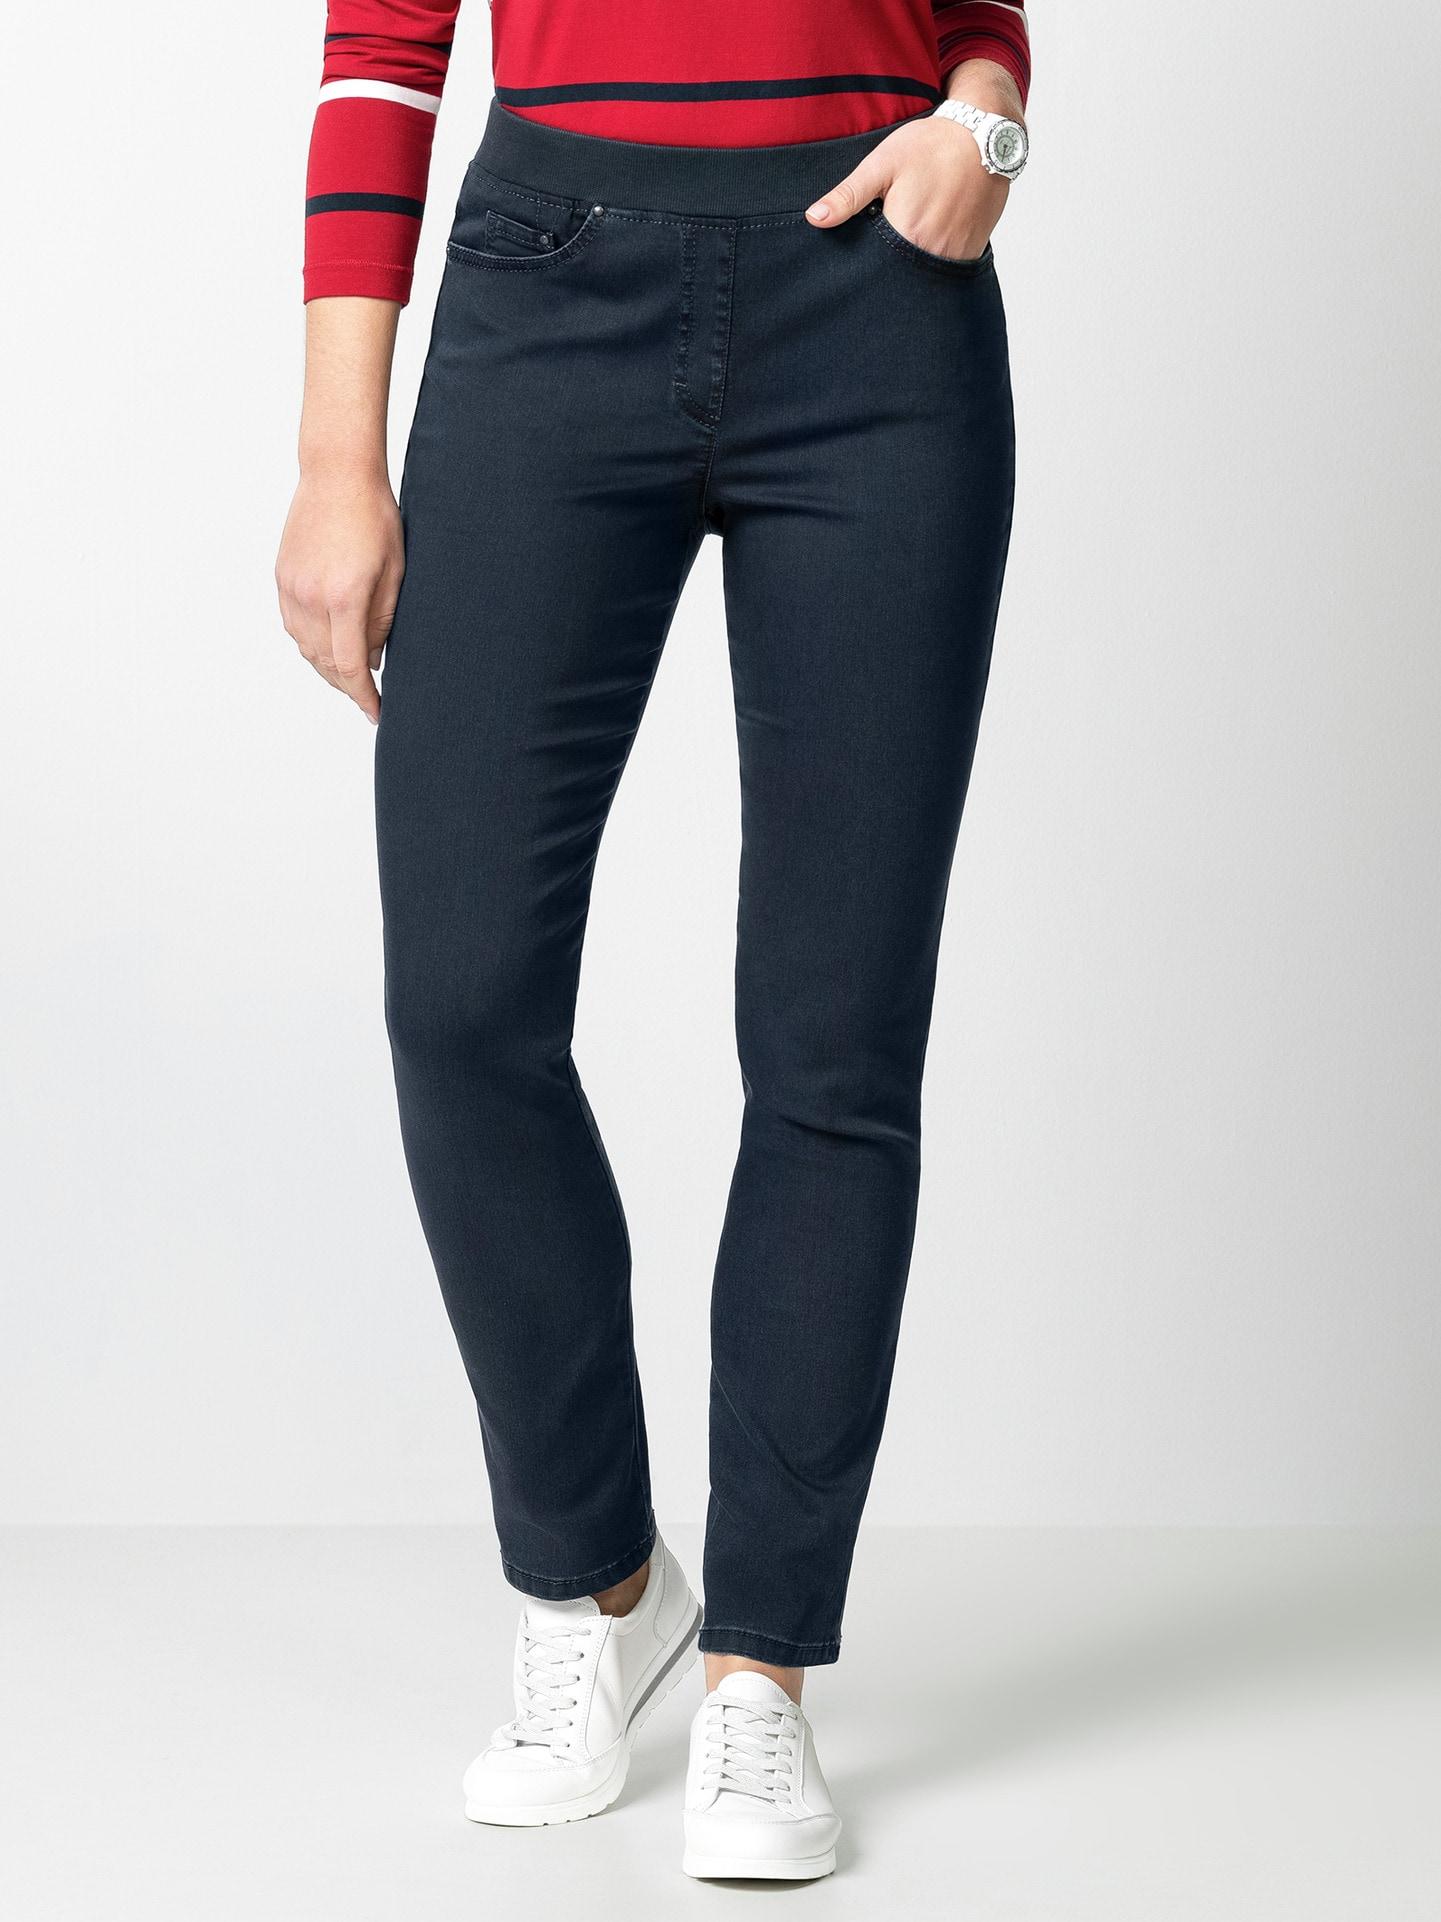 raphaela by brax dynamic jeans sf kaufen sie hier walbusch. Black Bedroom Furniture Sets. Home Design Ideas